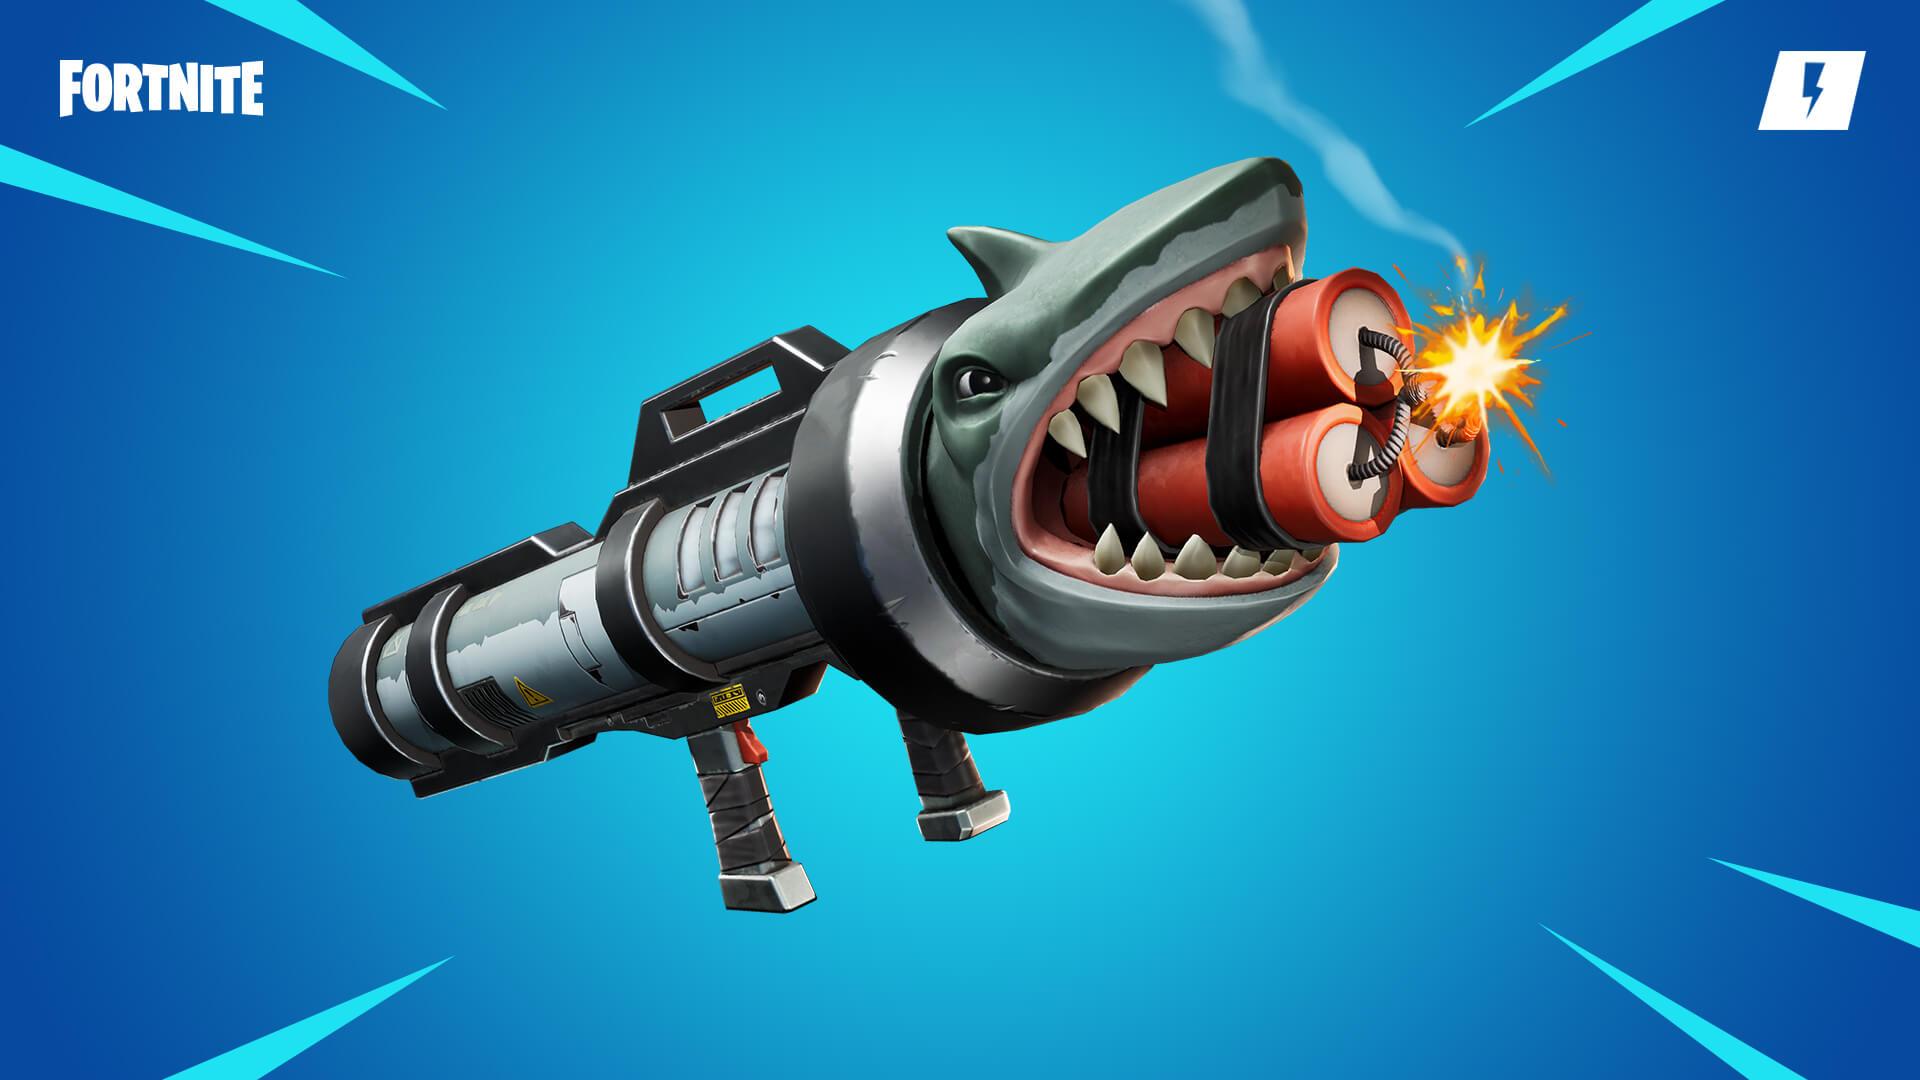 Fortnite Save the World Shark Attack Launcher